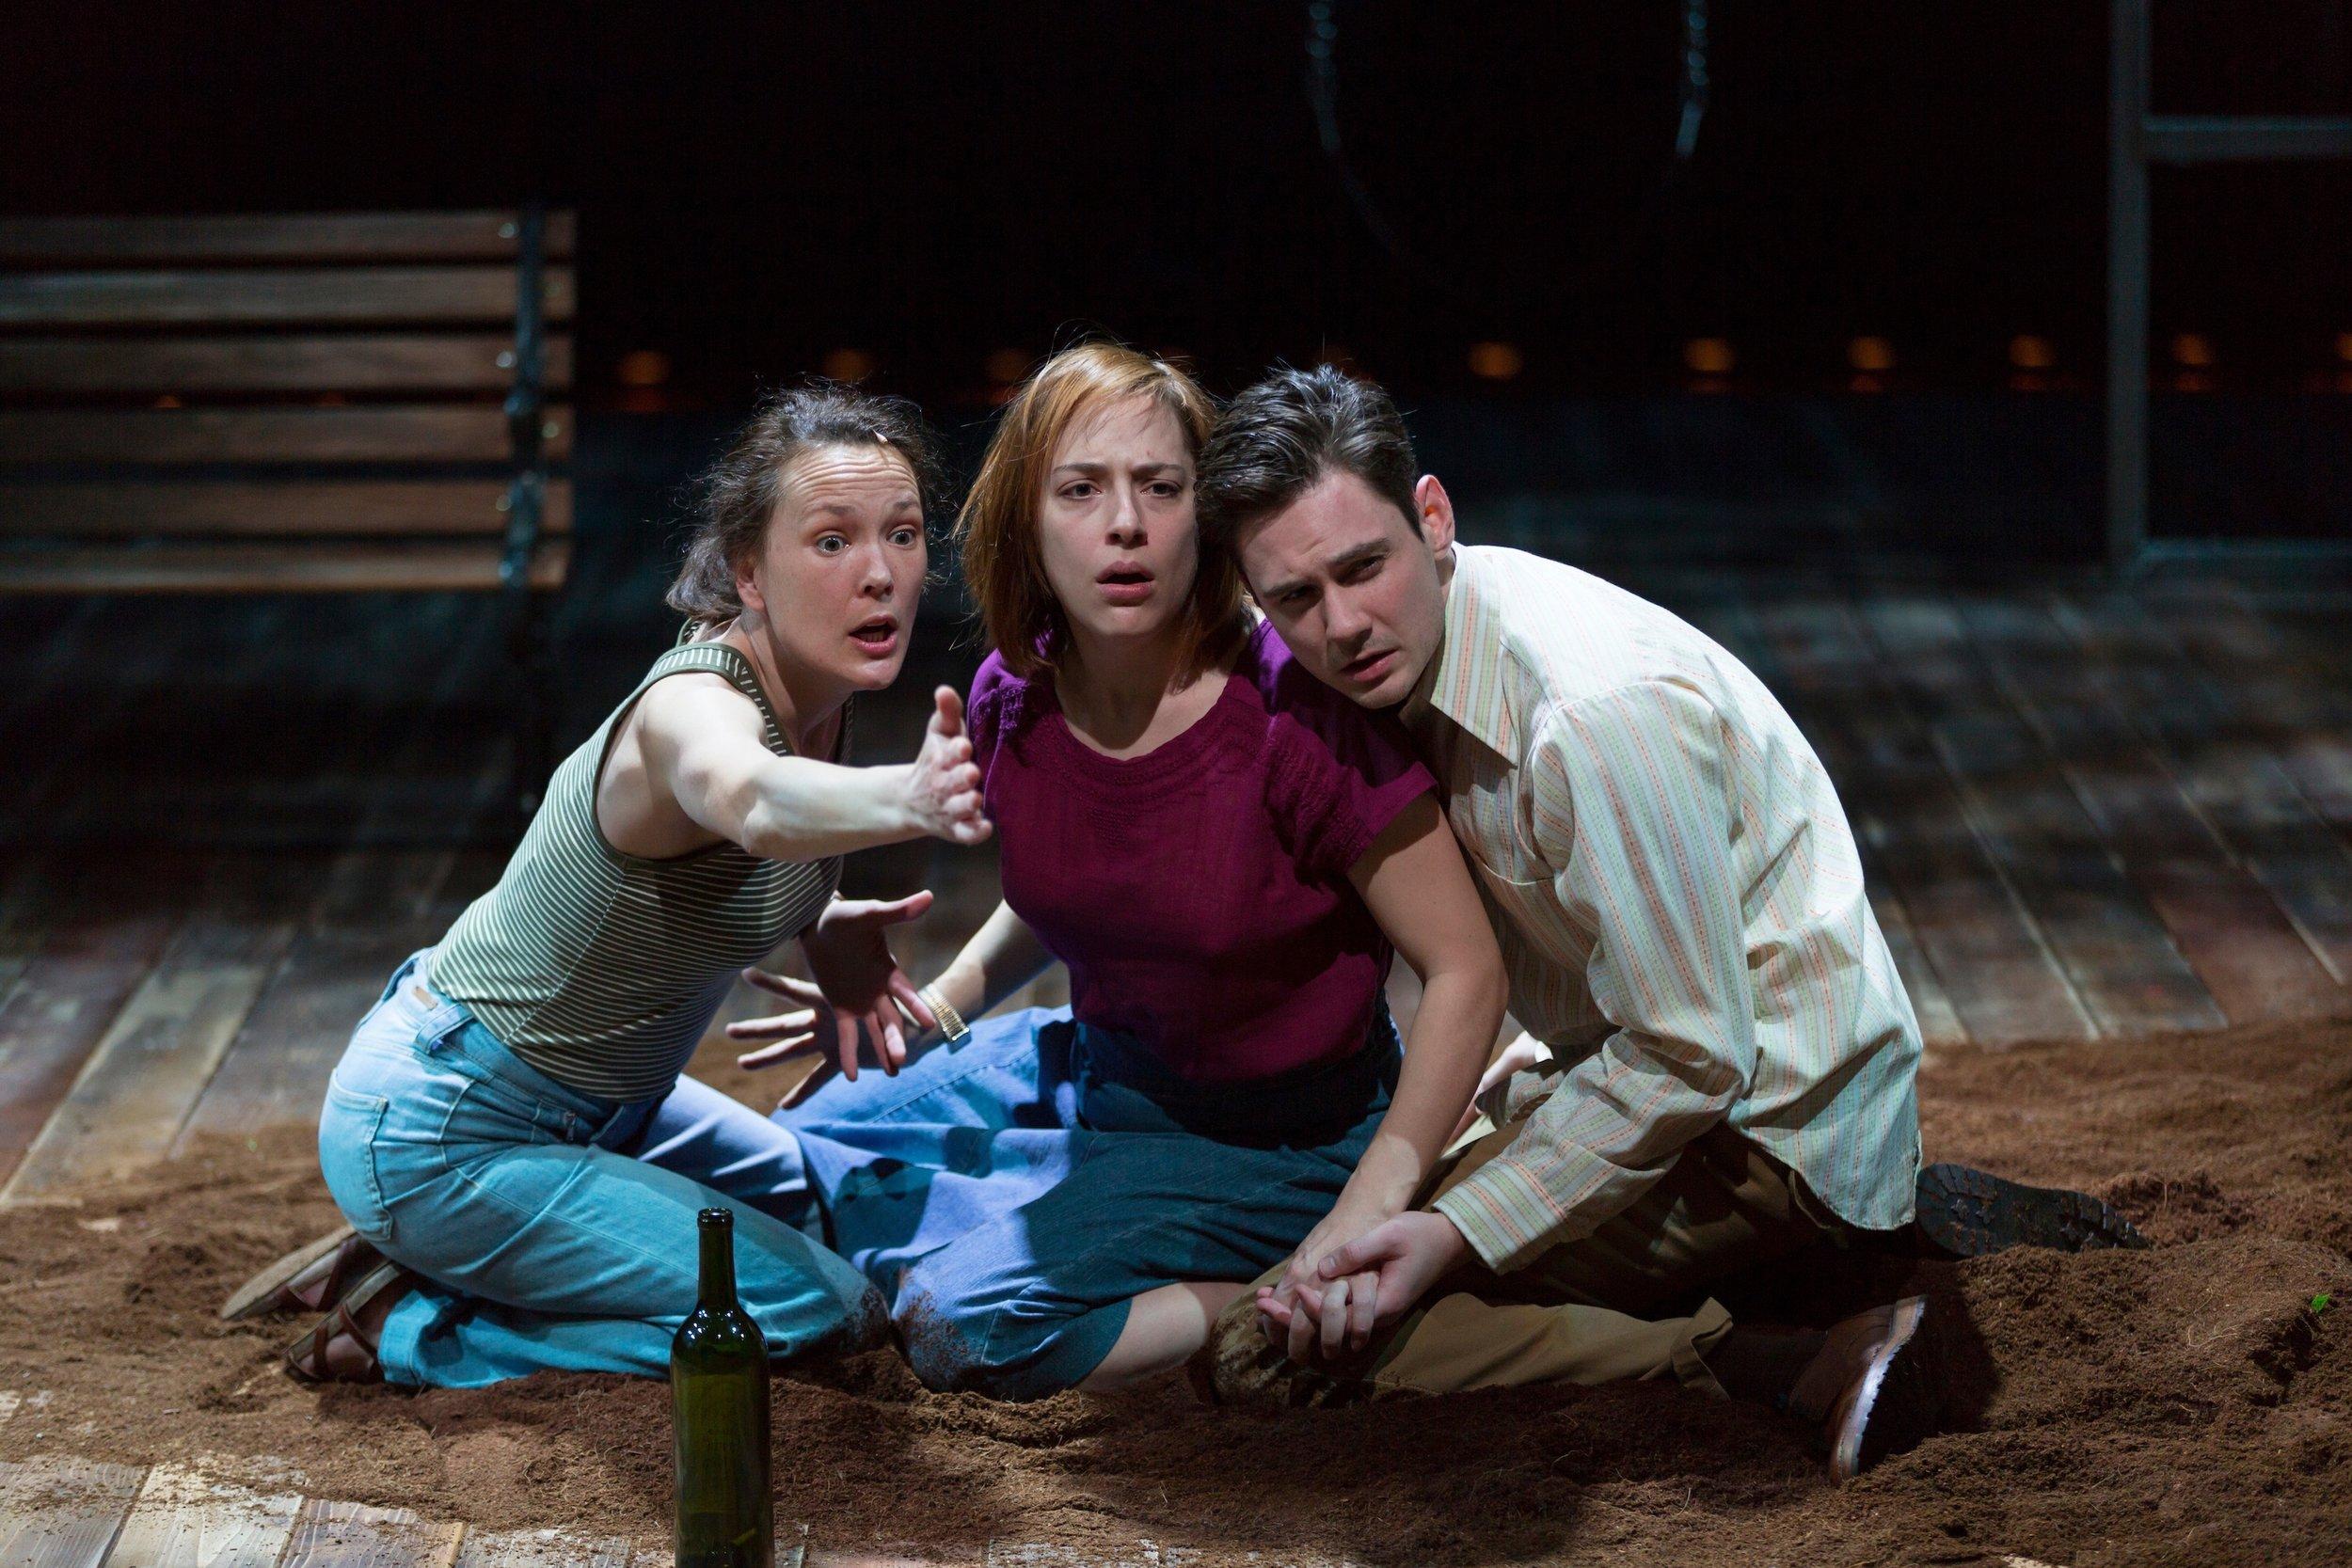 Lin (Sarah Lemp), Victoria (Emily Gunyou Halaas), Edward (Tom Pecinka) (photo: T. Charles Erickson)